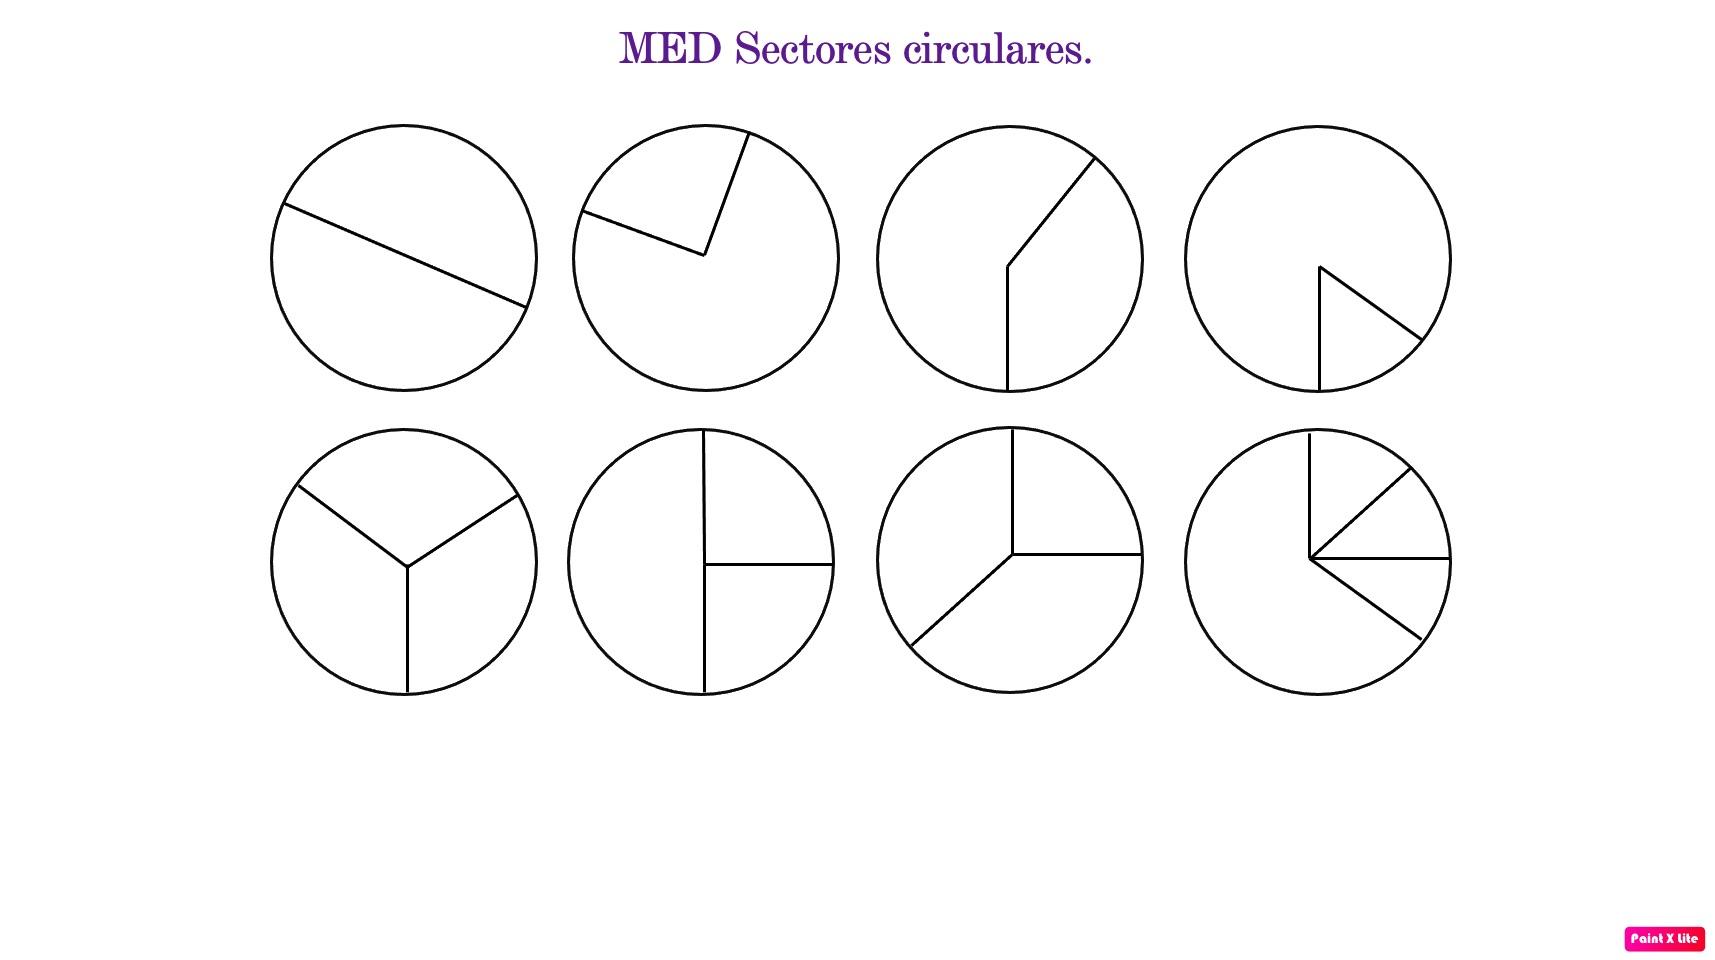 1207029474996070T194202111325_Sectores+circulares.jpg